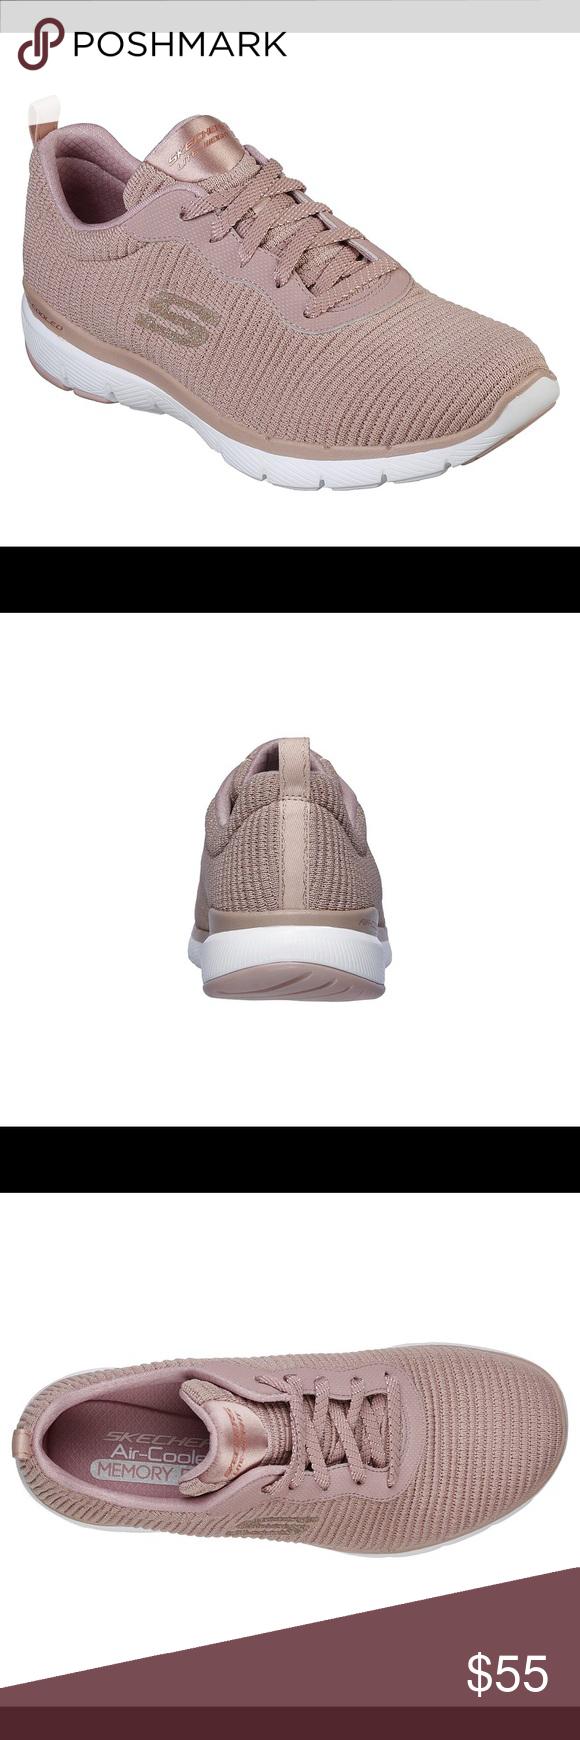 alfombra recuperar pluma  Spotted while shopping on Poshmark: FLEX APPEAL 3.0 - ENDLESS GLAMOUR!  #poshmark #fashion #shopping #style #Skecher…   Glamour shoes, Clothes  design, Fashion design